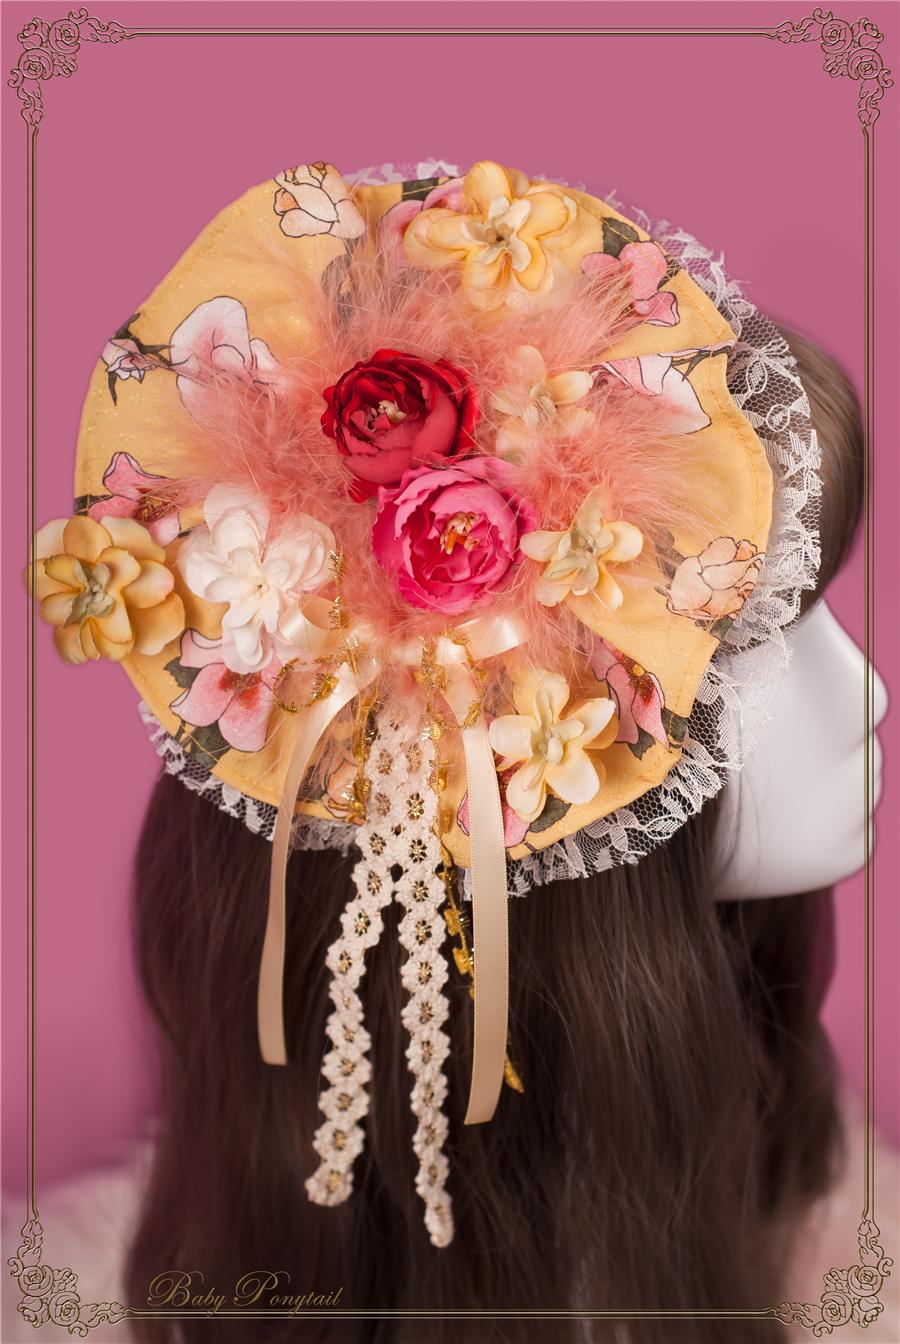 Babyponytail_Accessory_Flower Head Dress_4.jpg